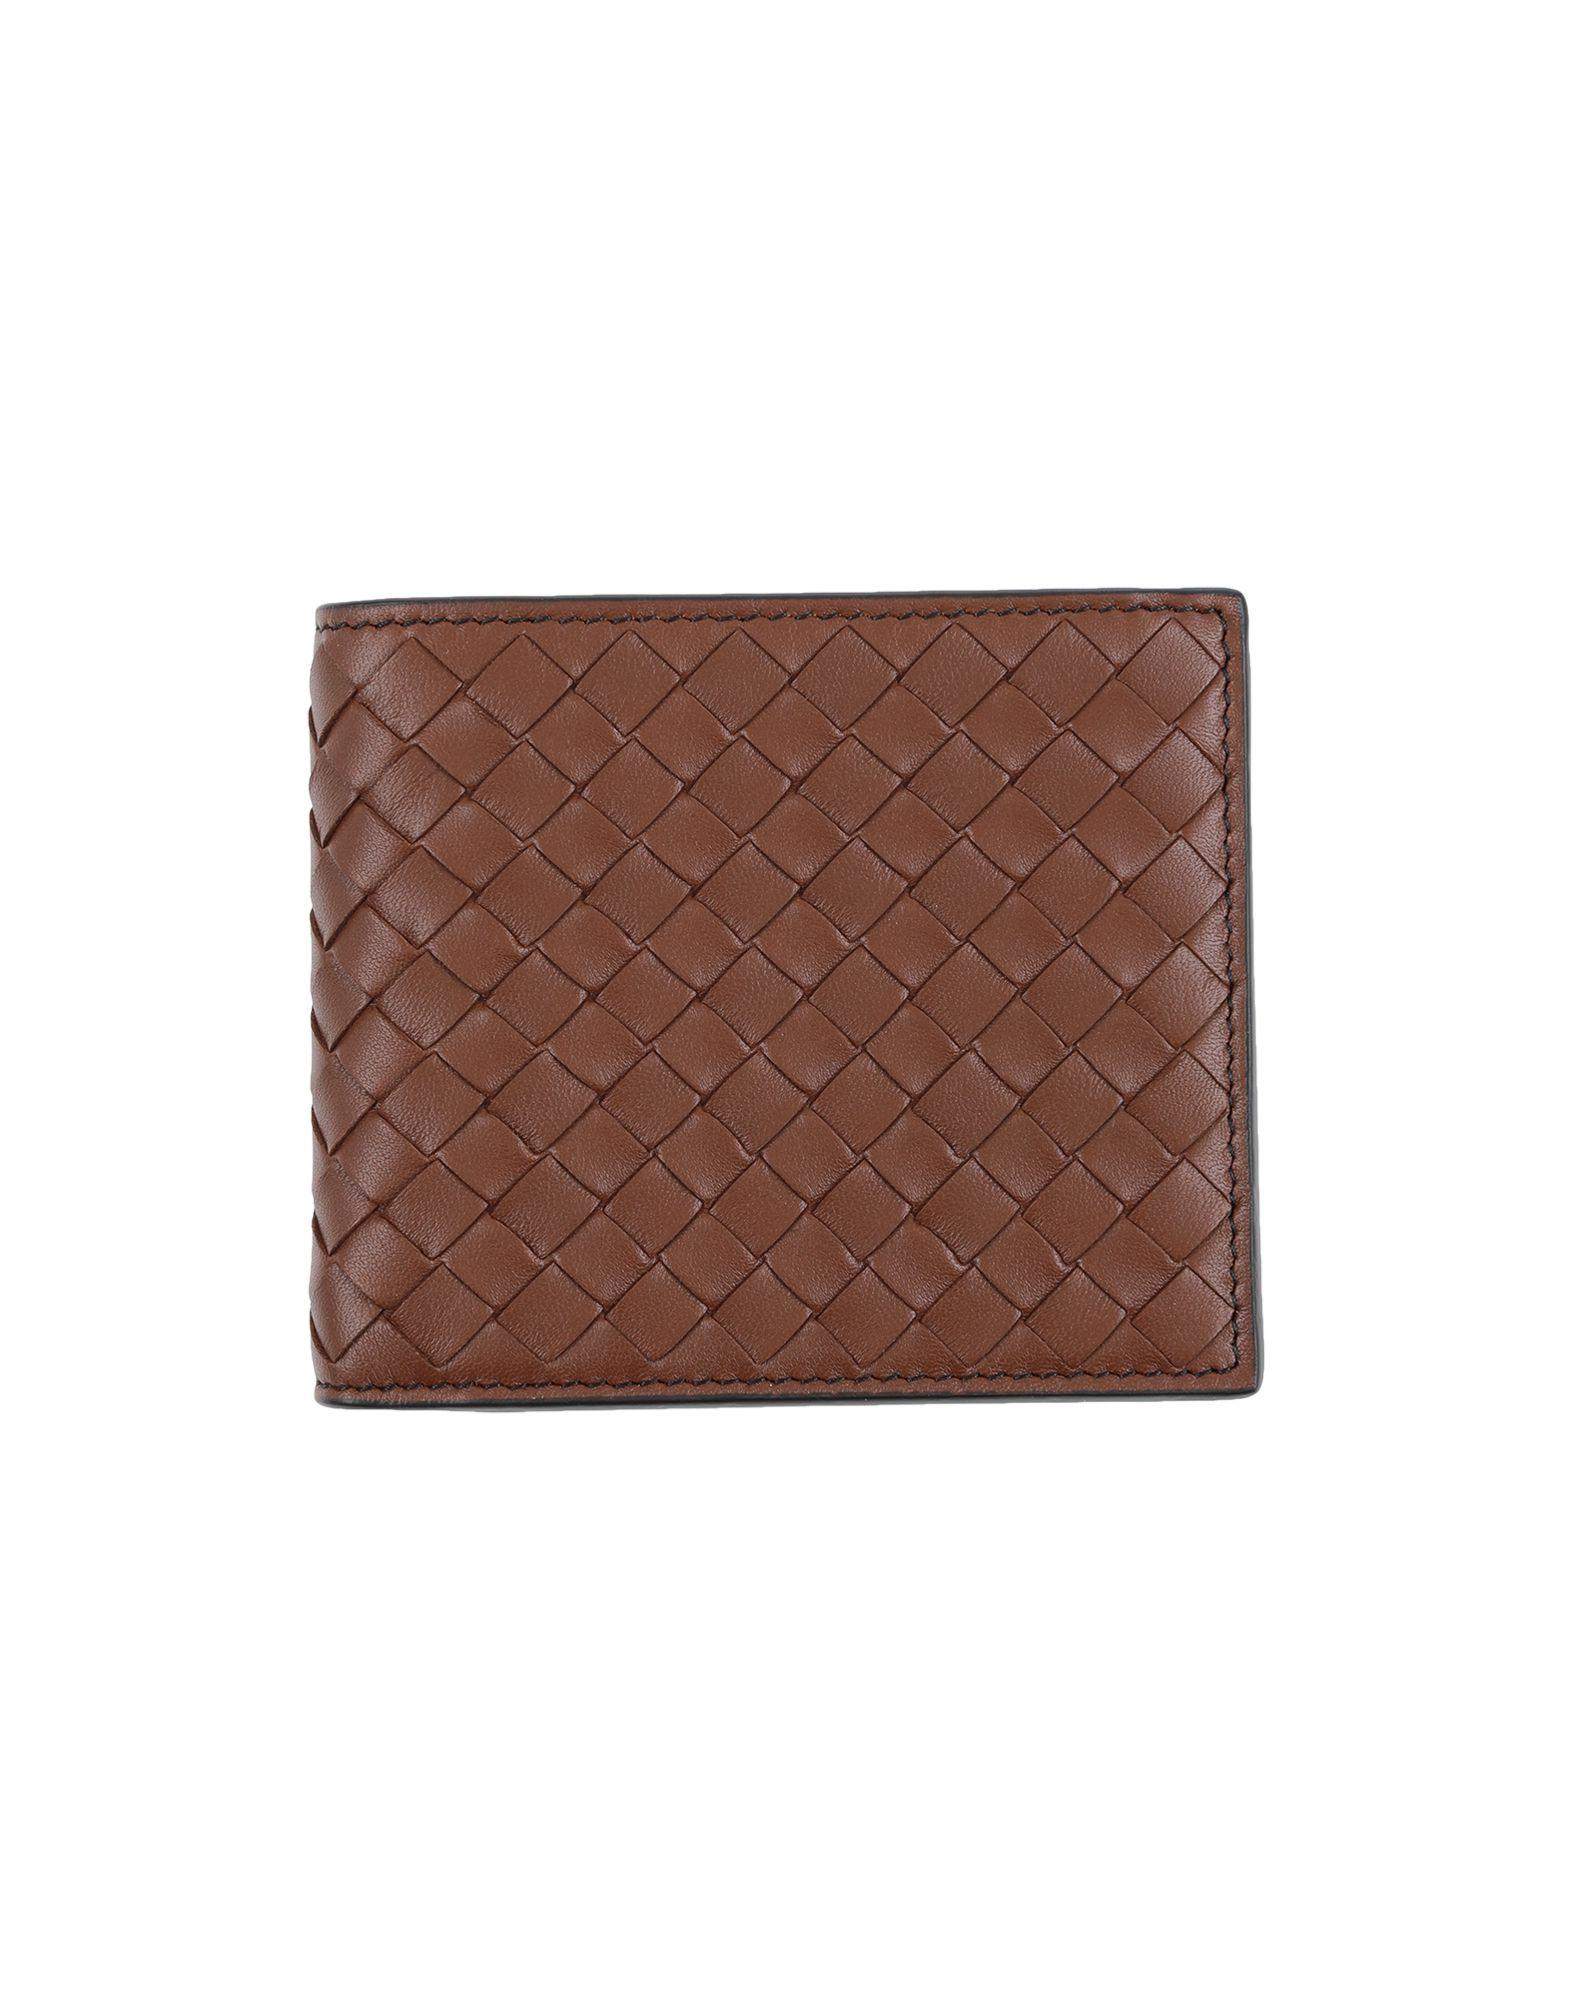 f022f64db000 ボッテガ・ヴェネタ(BOTTEGA VENETA) メンズ長財布 | 通販・人気 ...